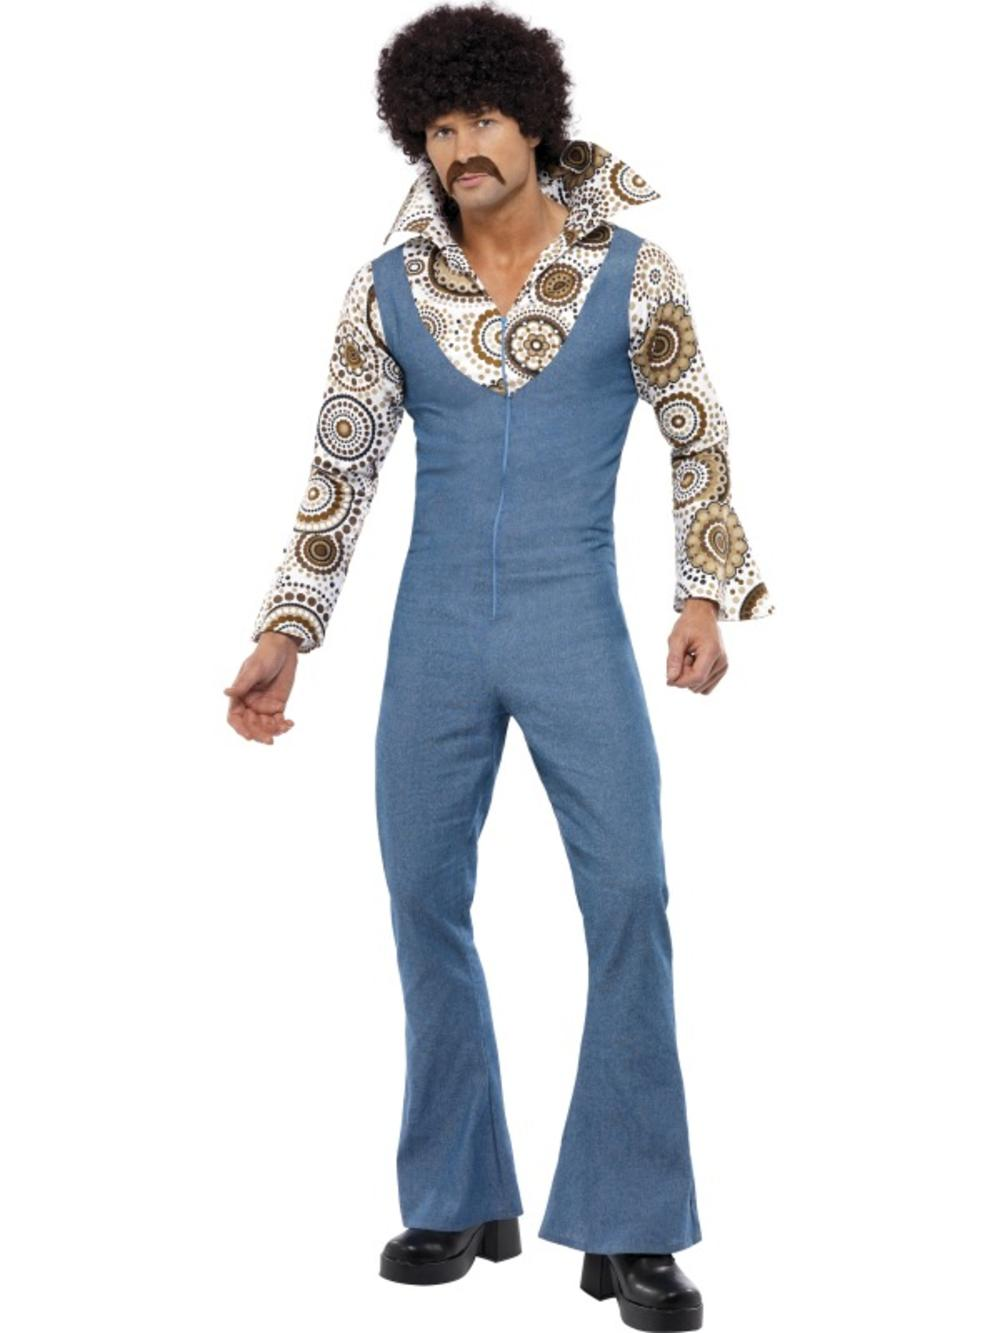 70s Groovy Disco Dancer Mens Fancy Dress 1970s Retro Jumpsuit Adults Costume